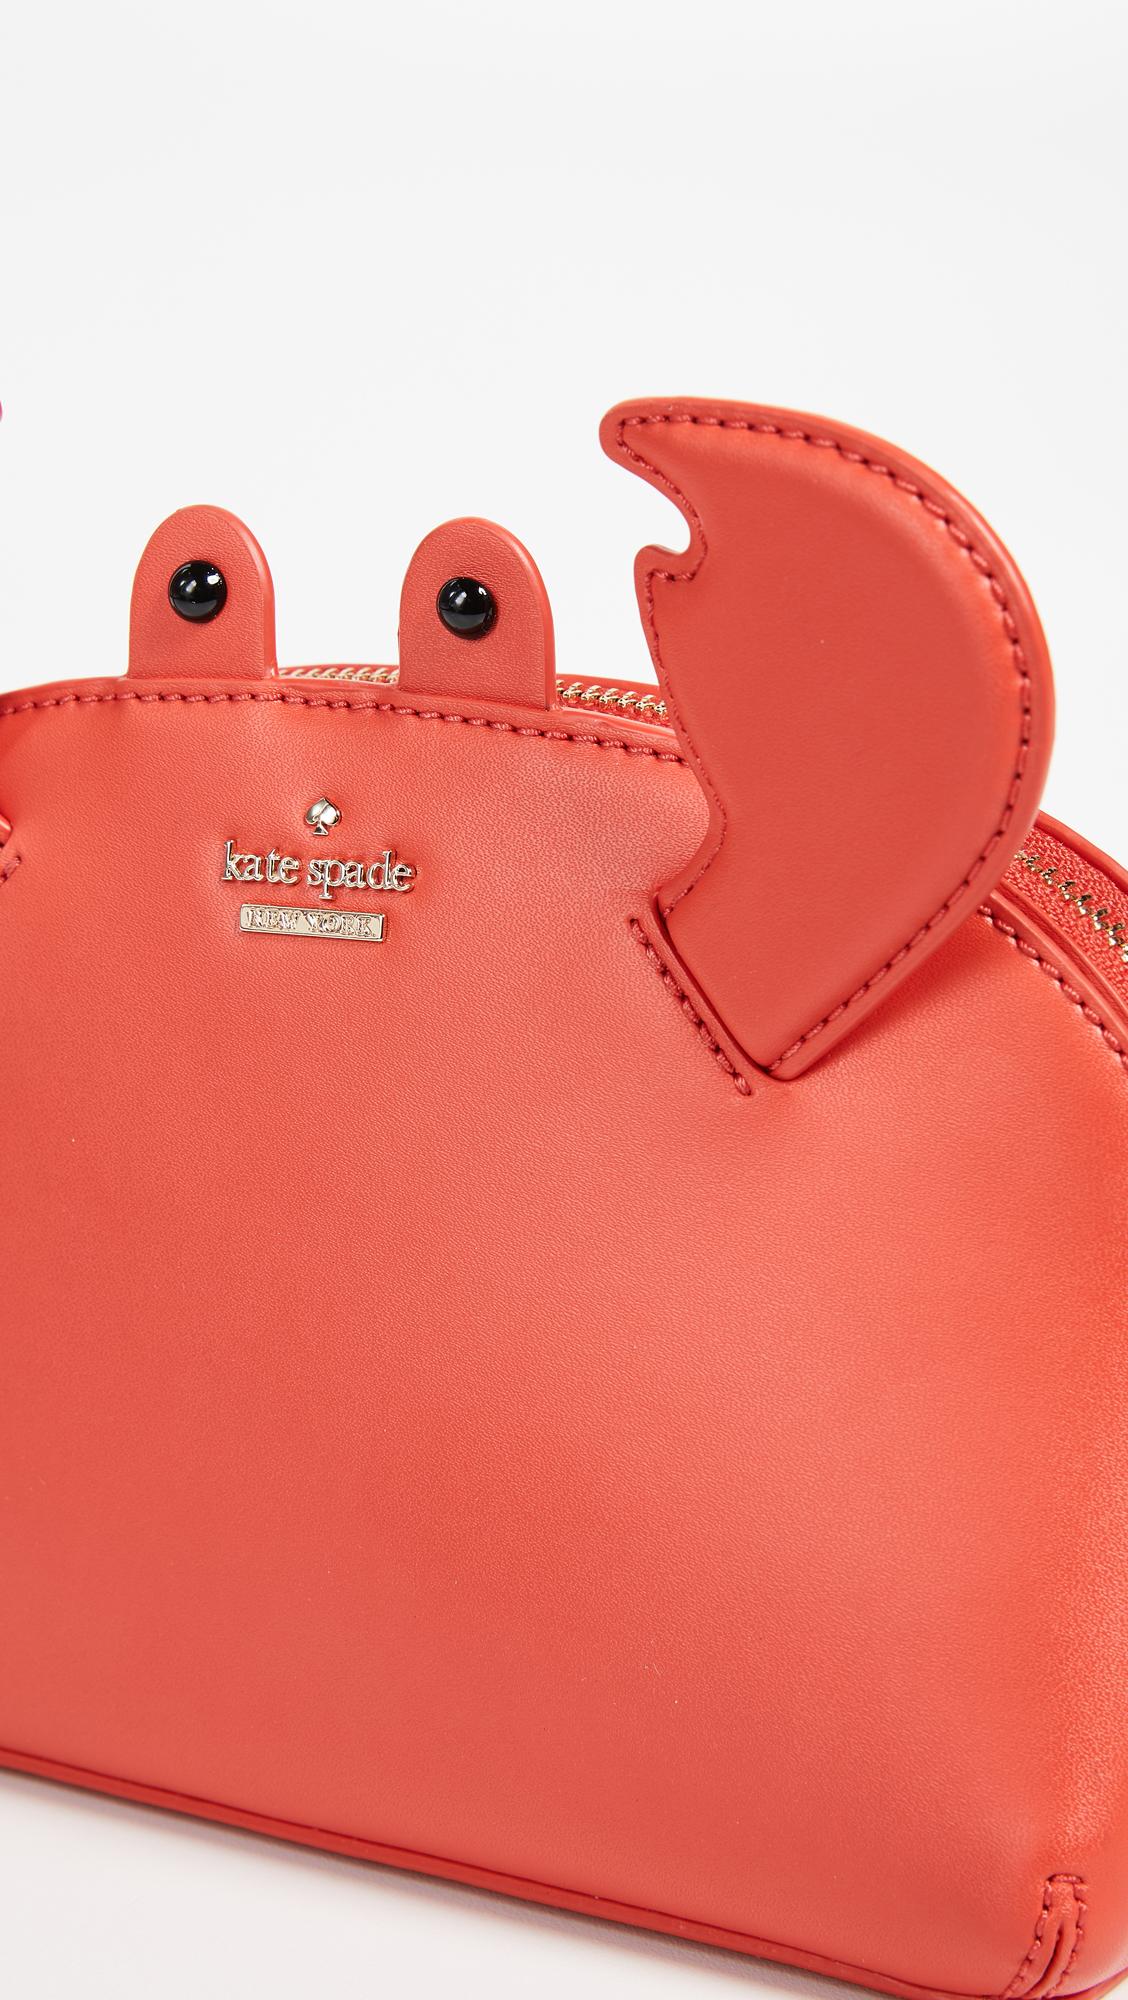 Hilli Shore Crab Kate Spade Body New Thing York Cross BagShopbop VSzqUMp